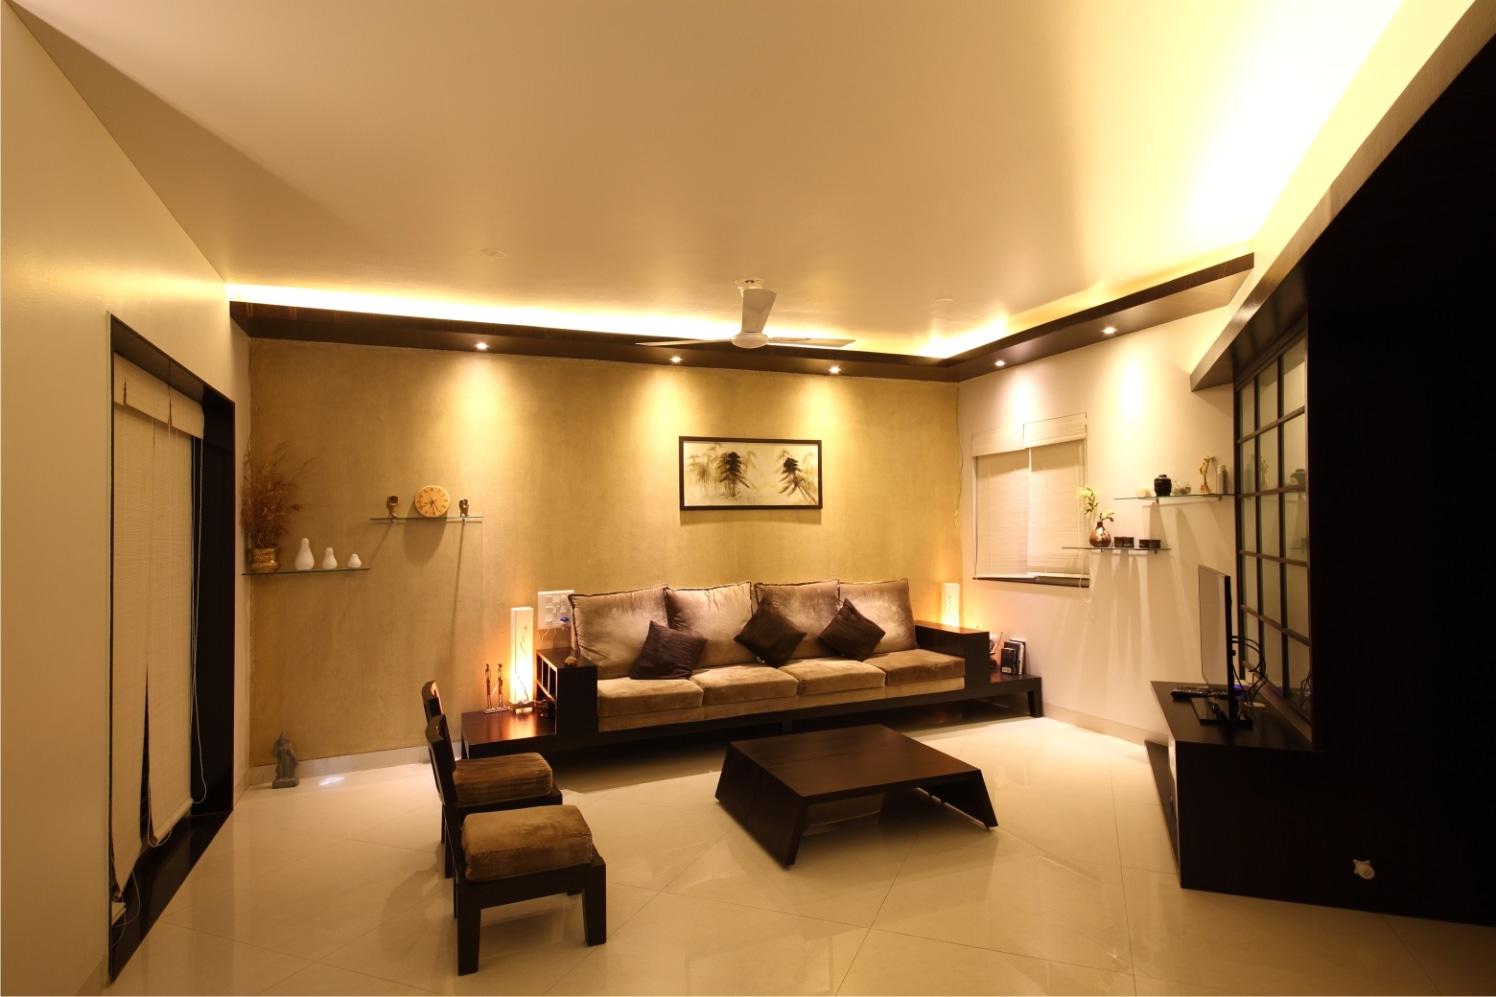 Beige Mid Century Modern Sofa With White Travertine Tiles by Rajas Joshi Living-room Modern | Interior Design Photos & Ideas